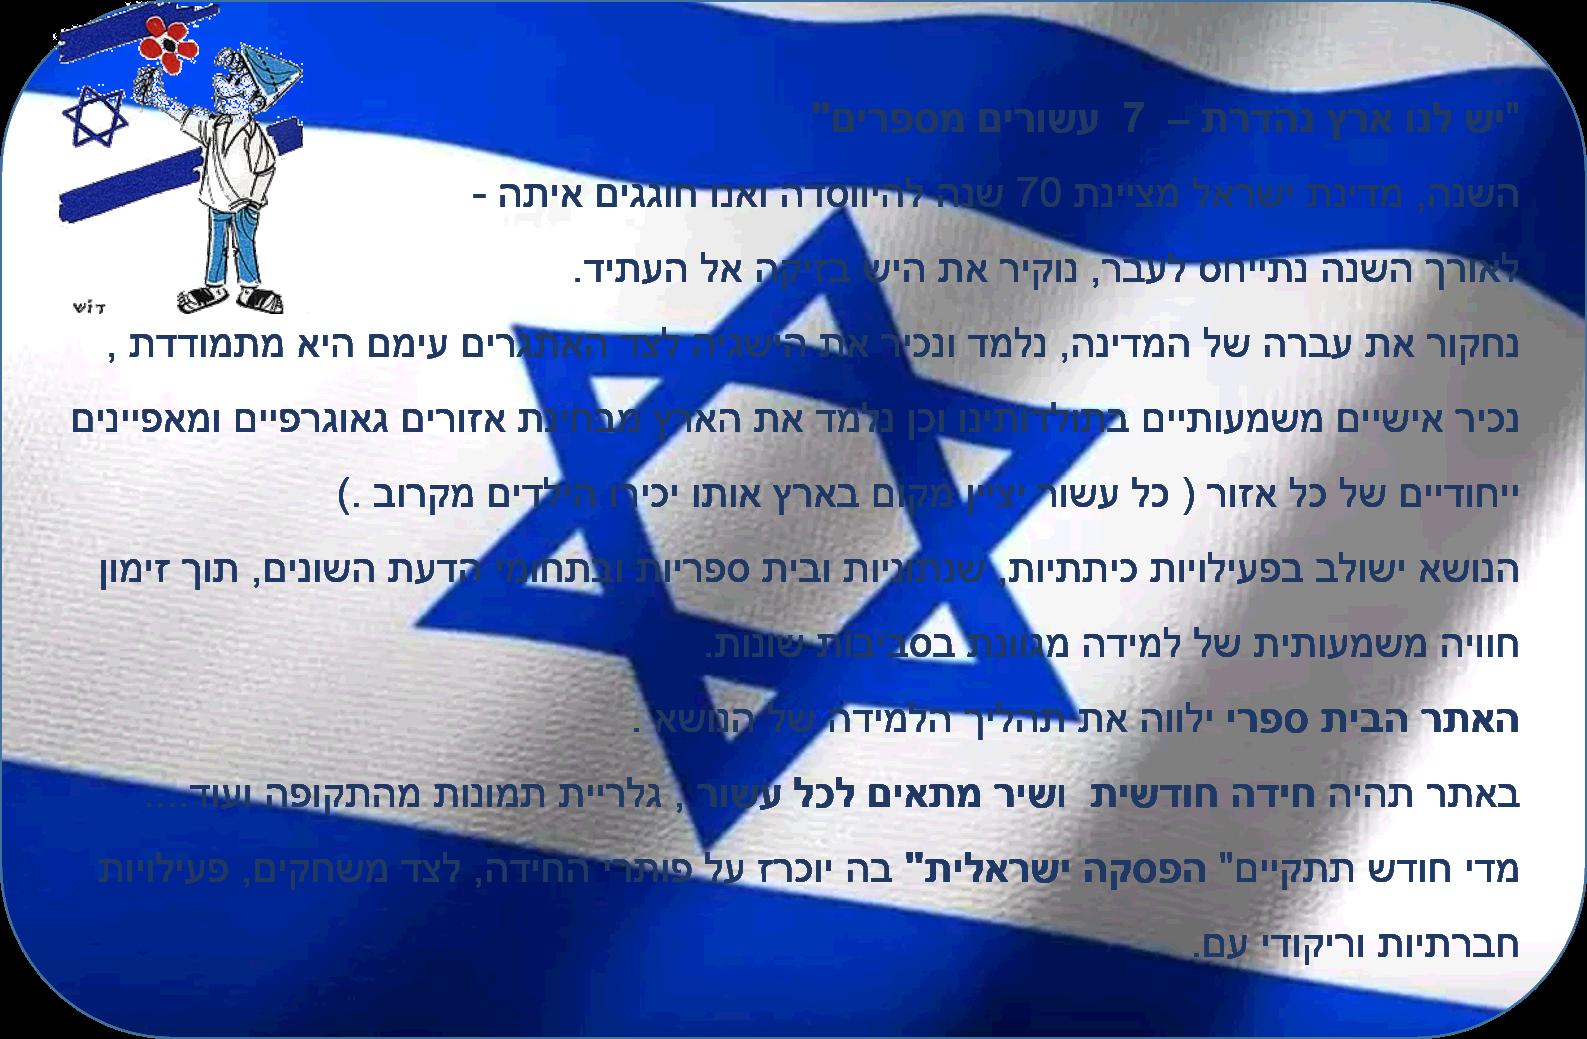 https://sites.google.com/a/harod.tzafonet.org.il/israel90/